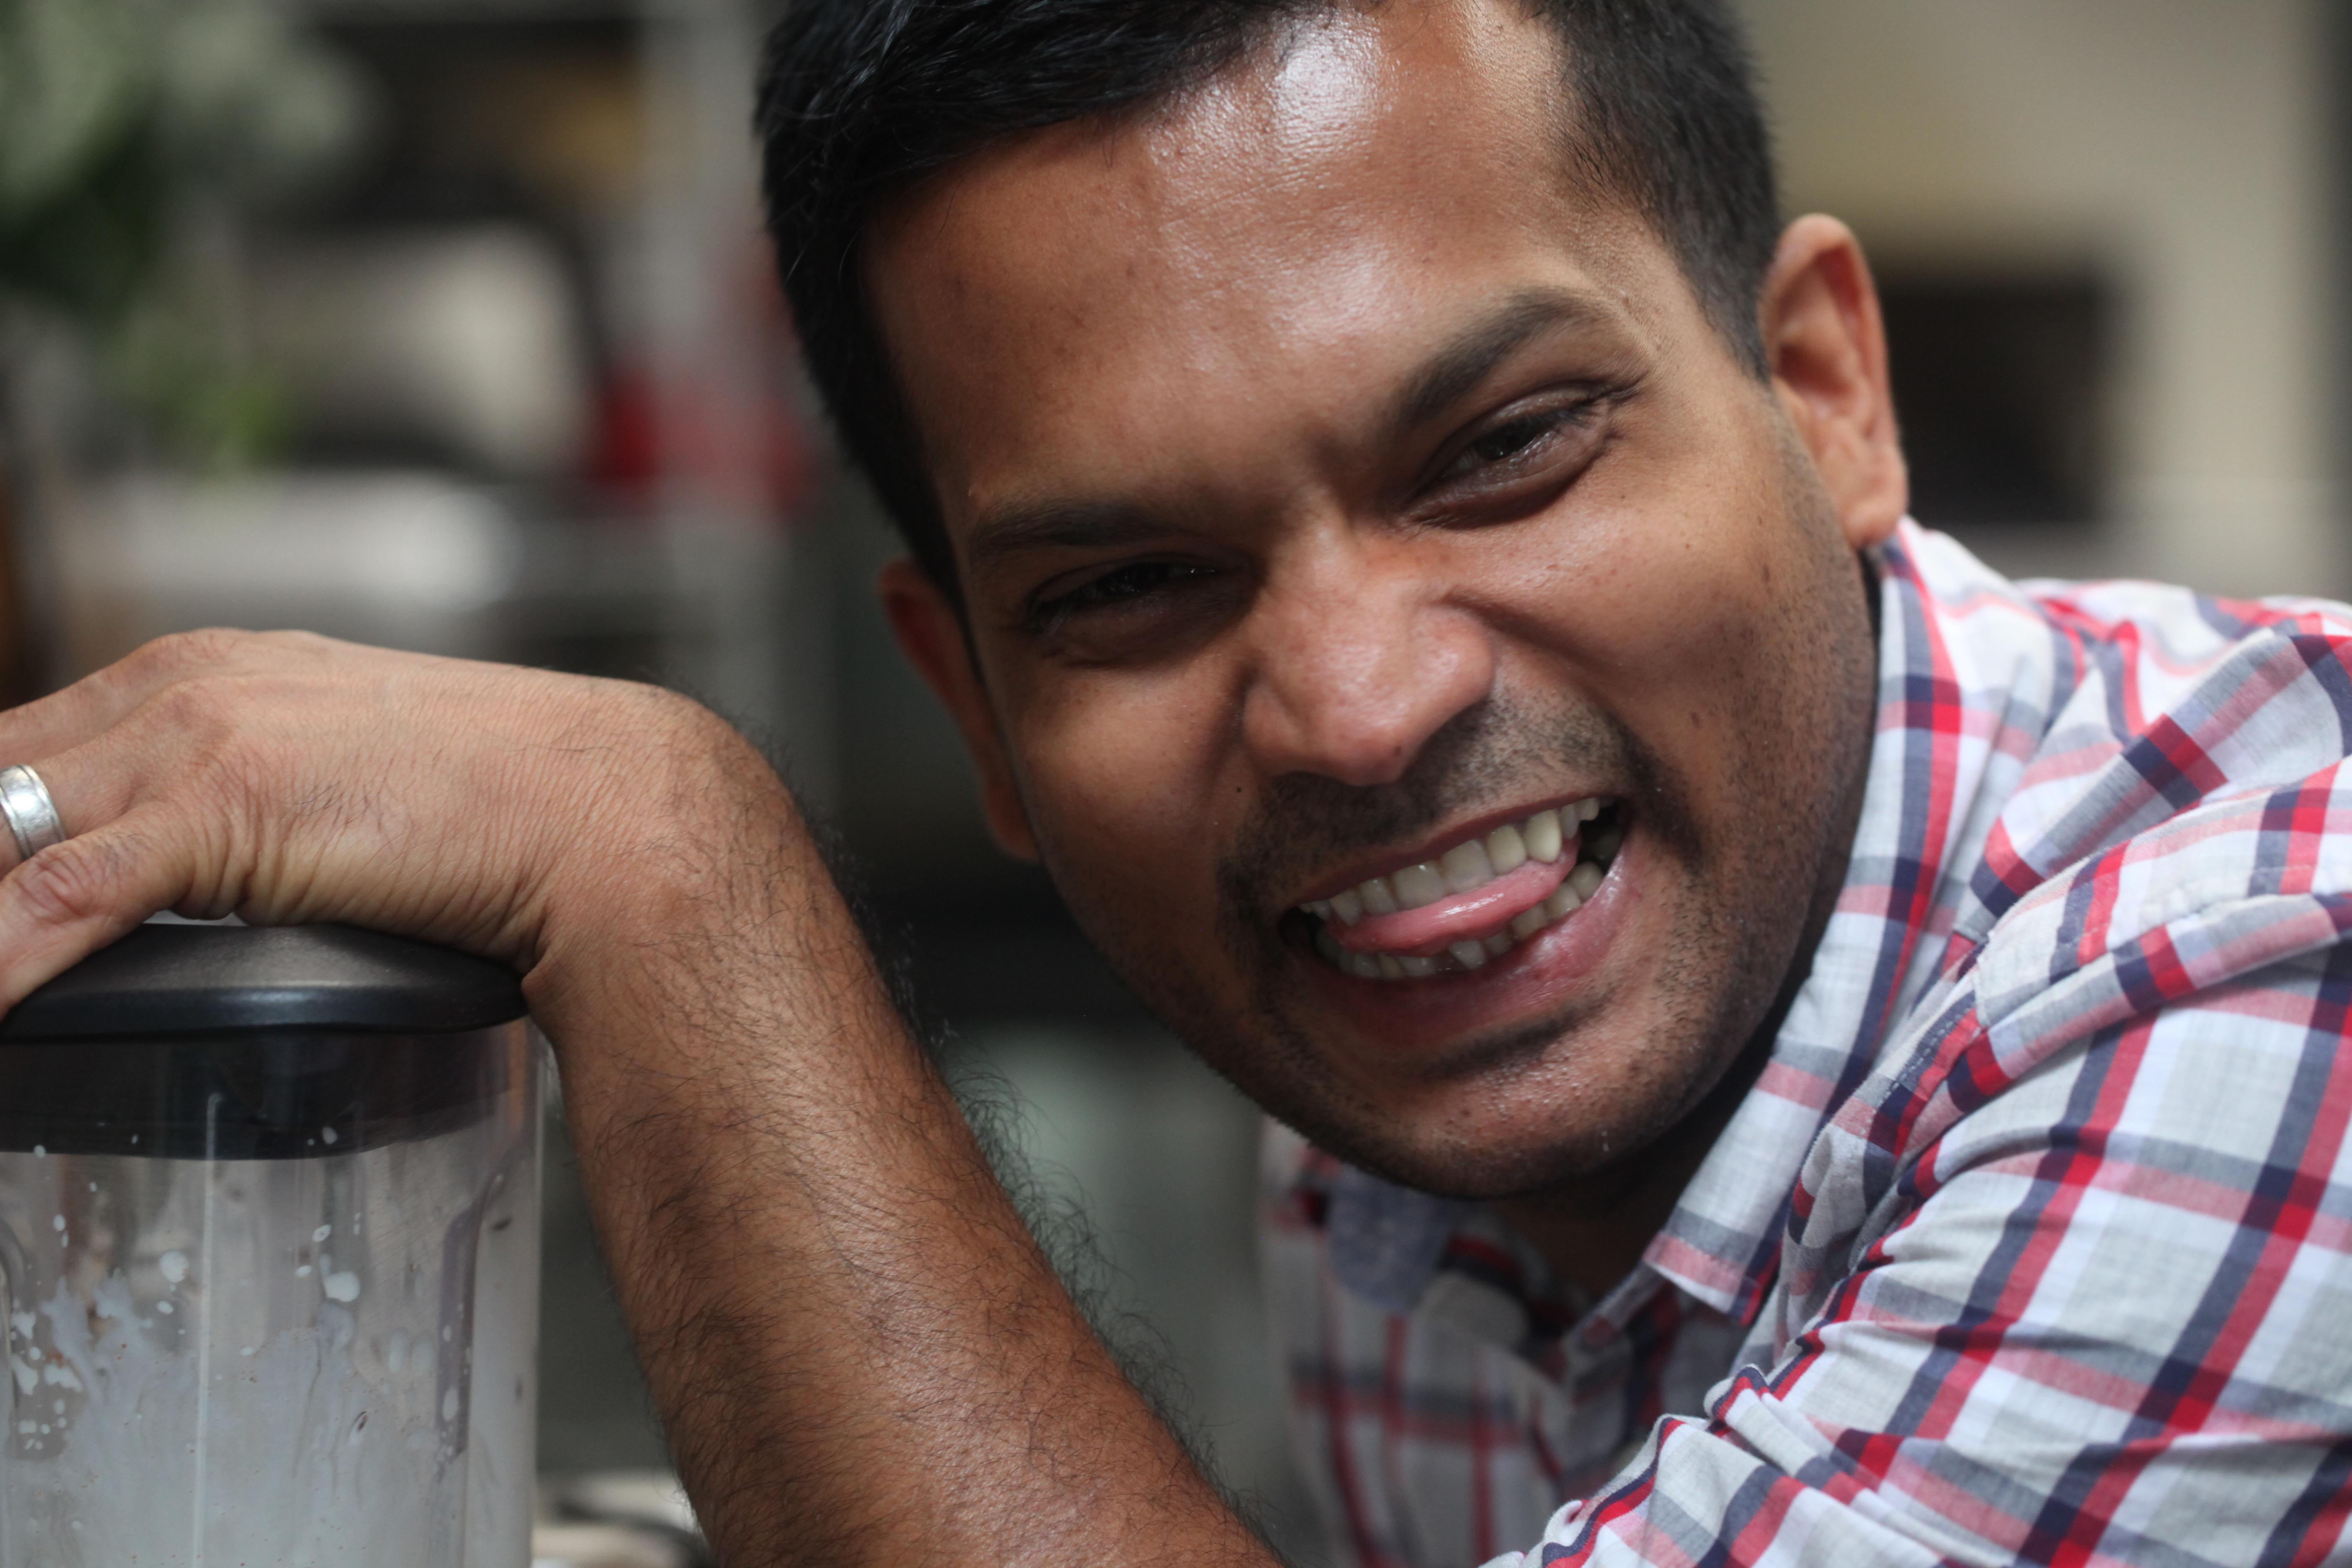 Man smirking with a blender